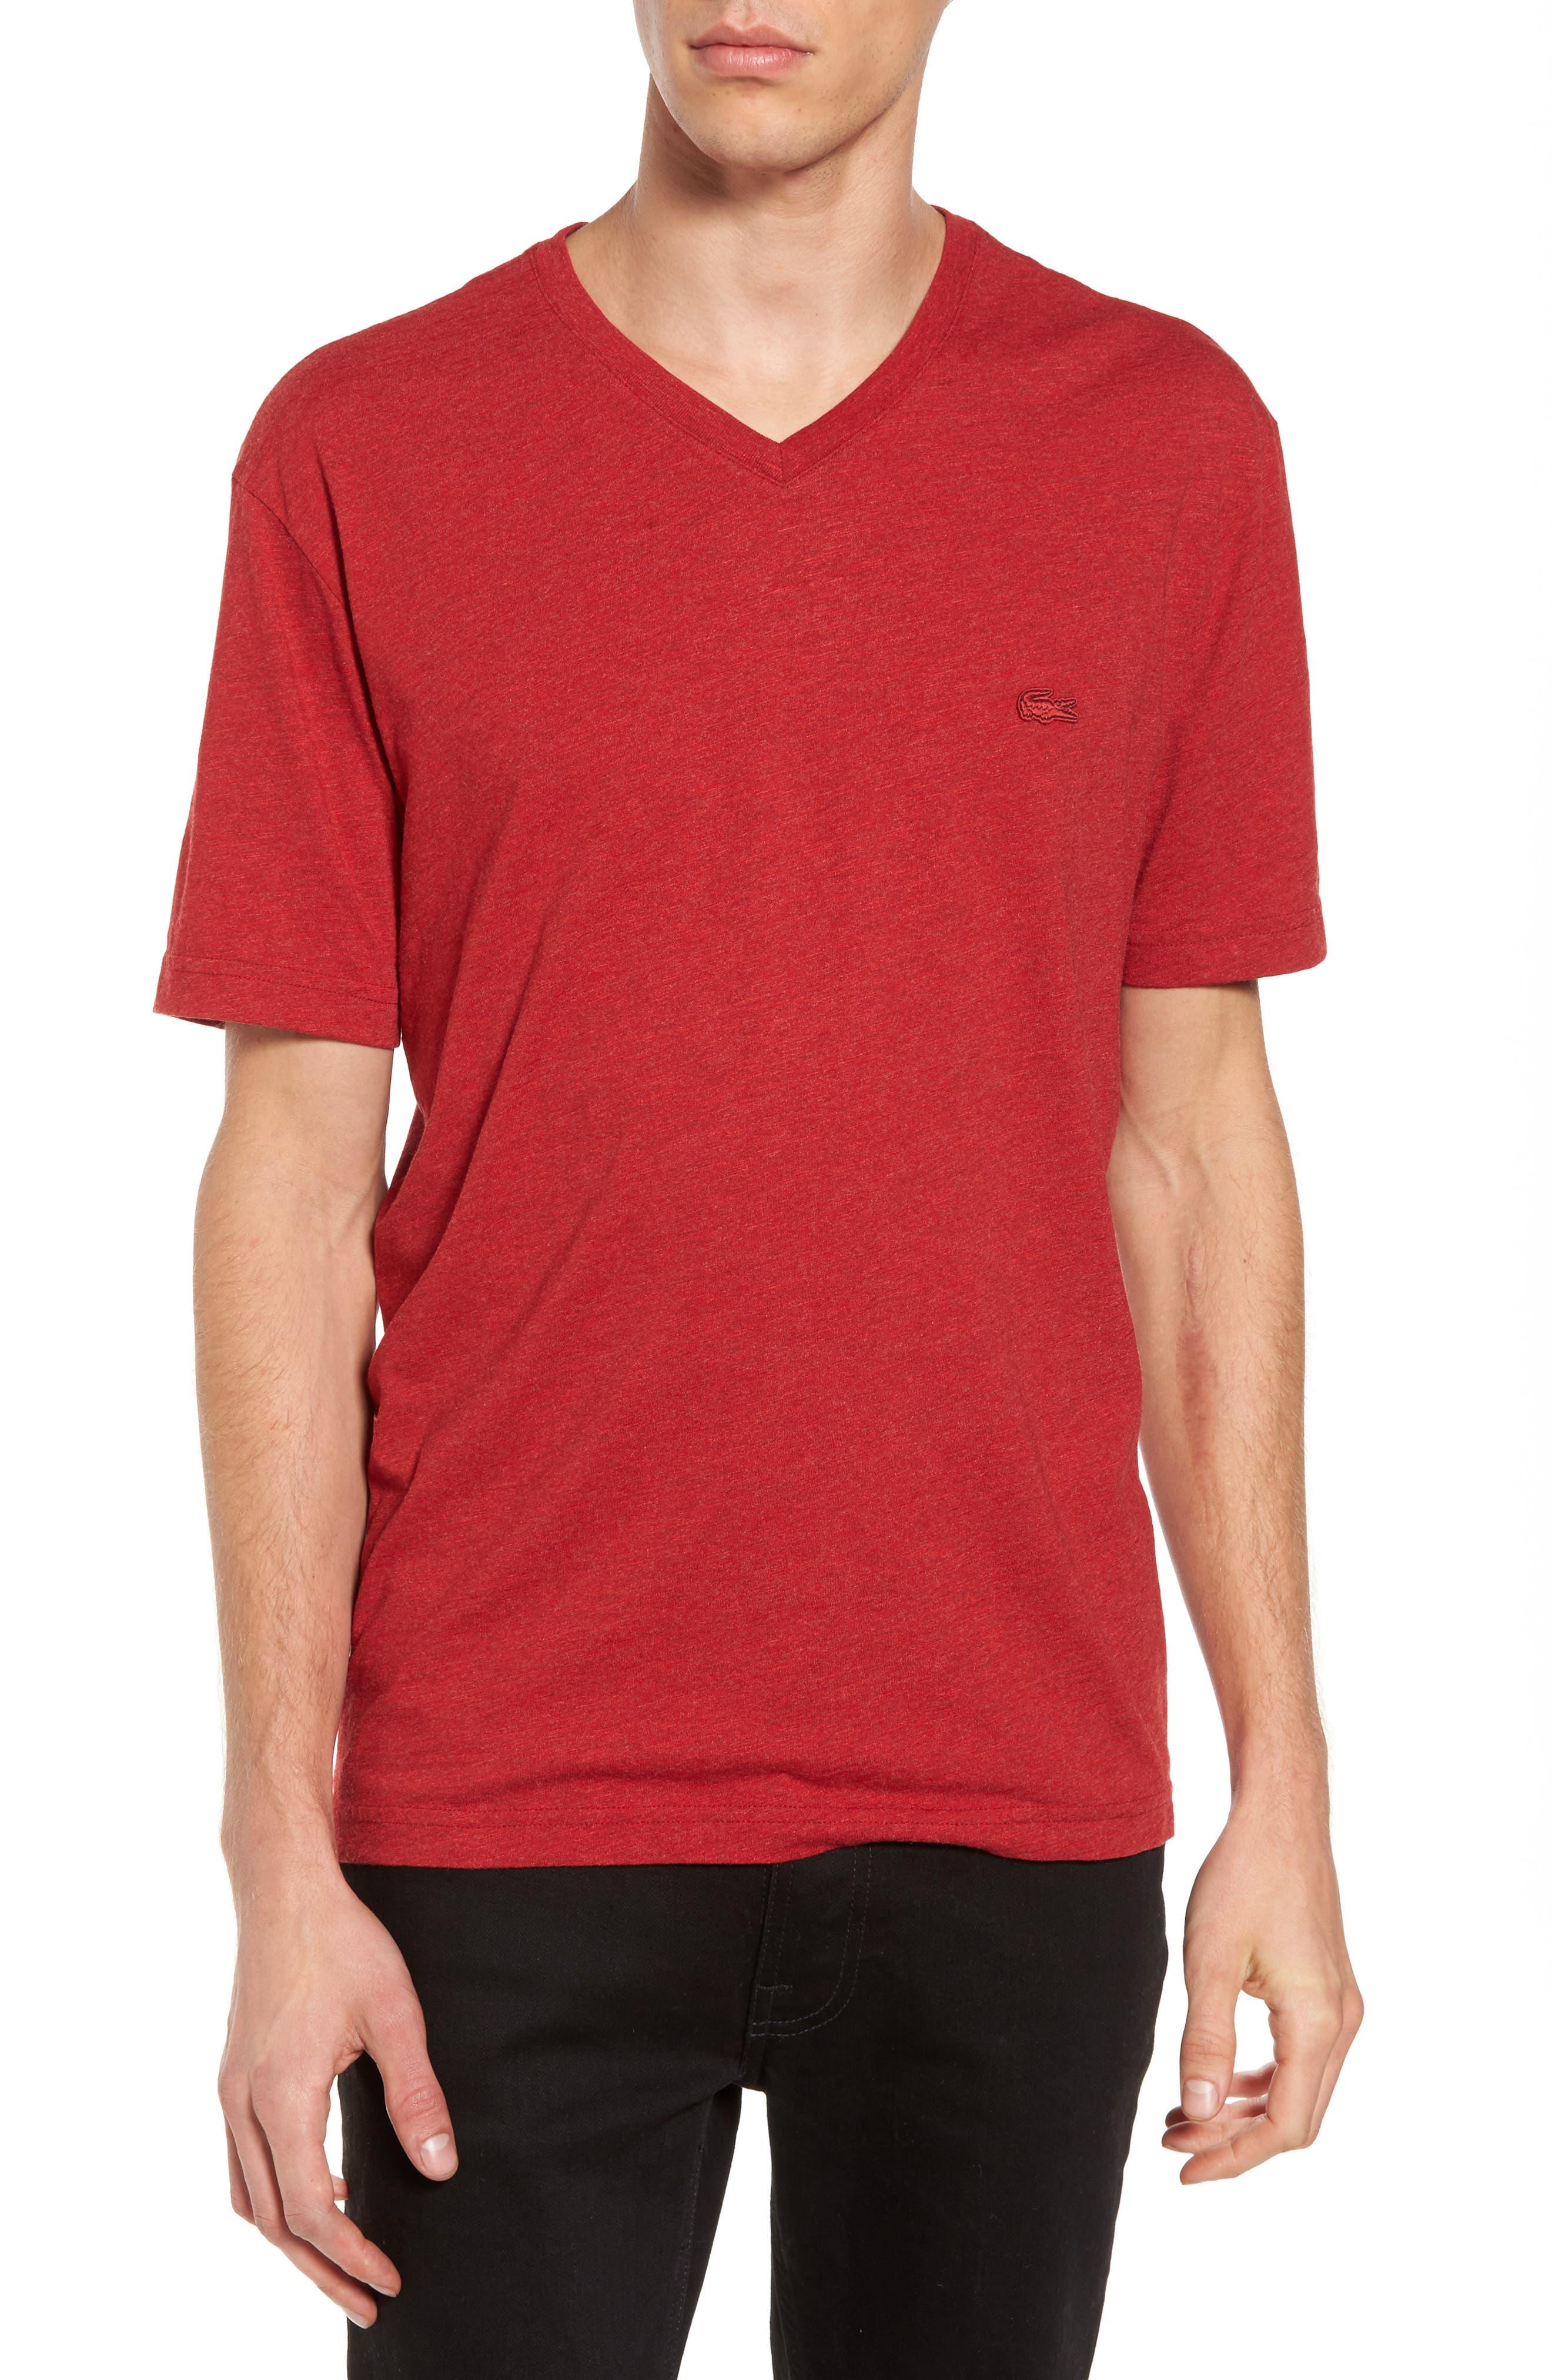 Main Image - Lacoste V-Neck T-Shirt